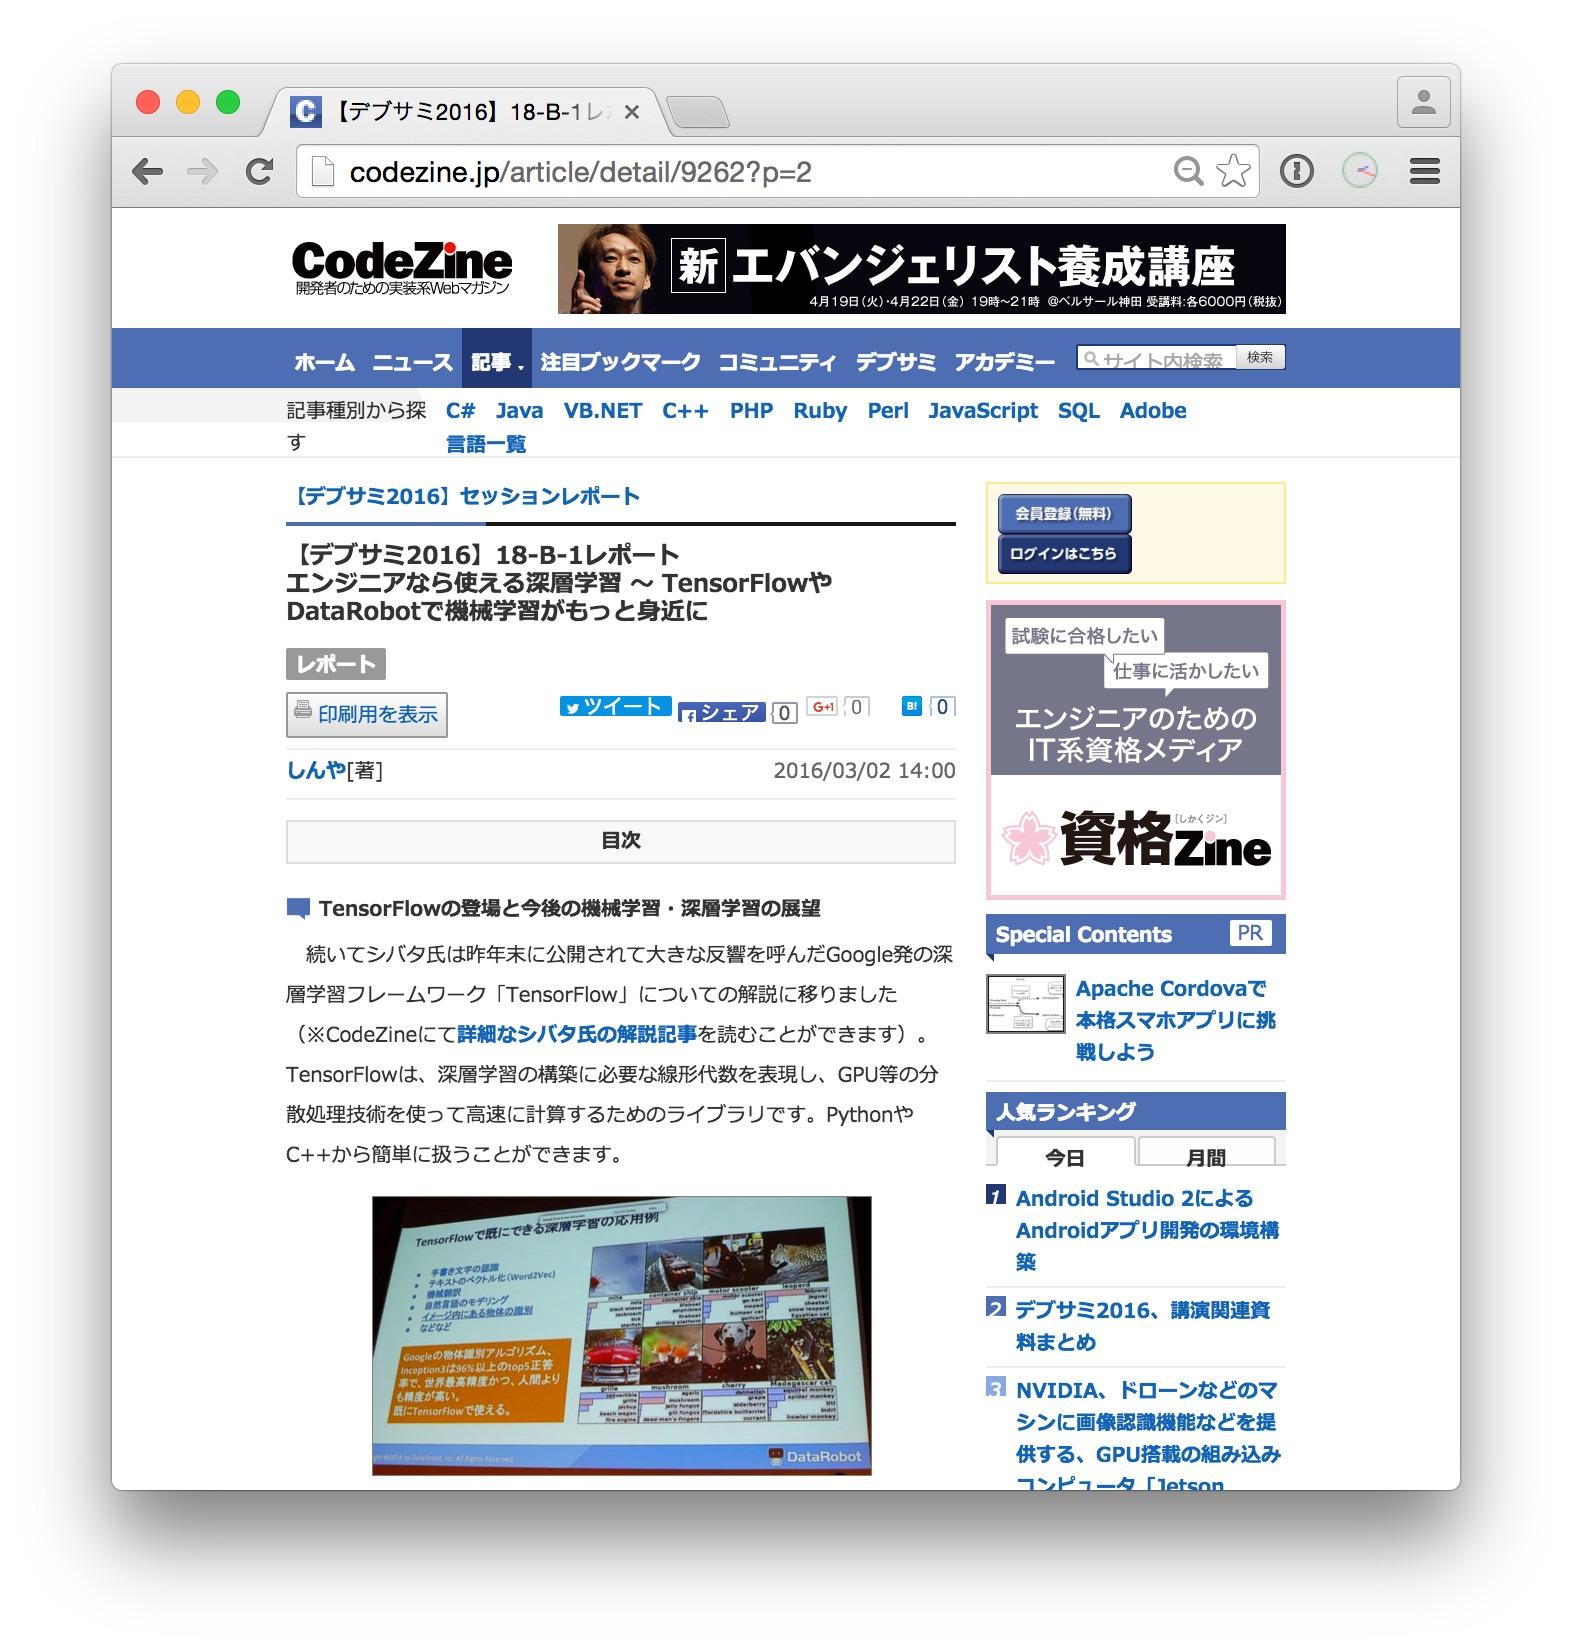 codezine-devsumi2016-report-01